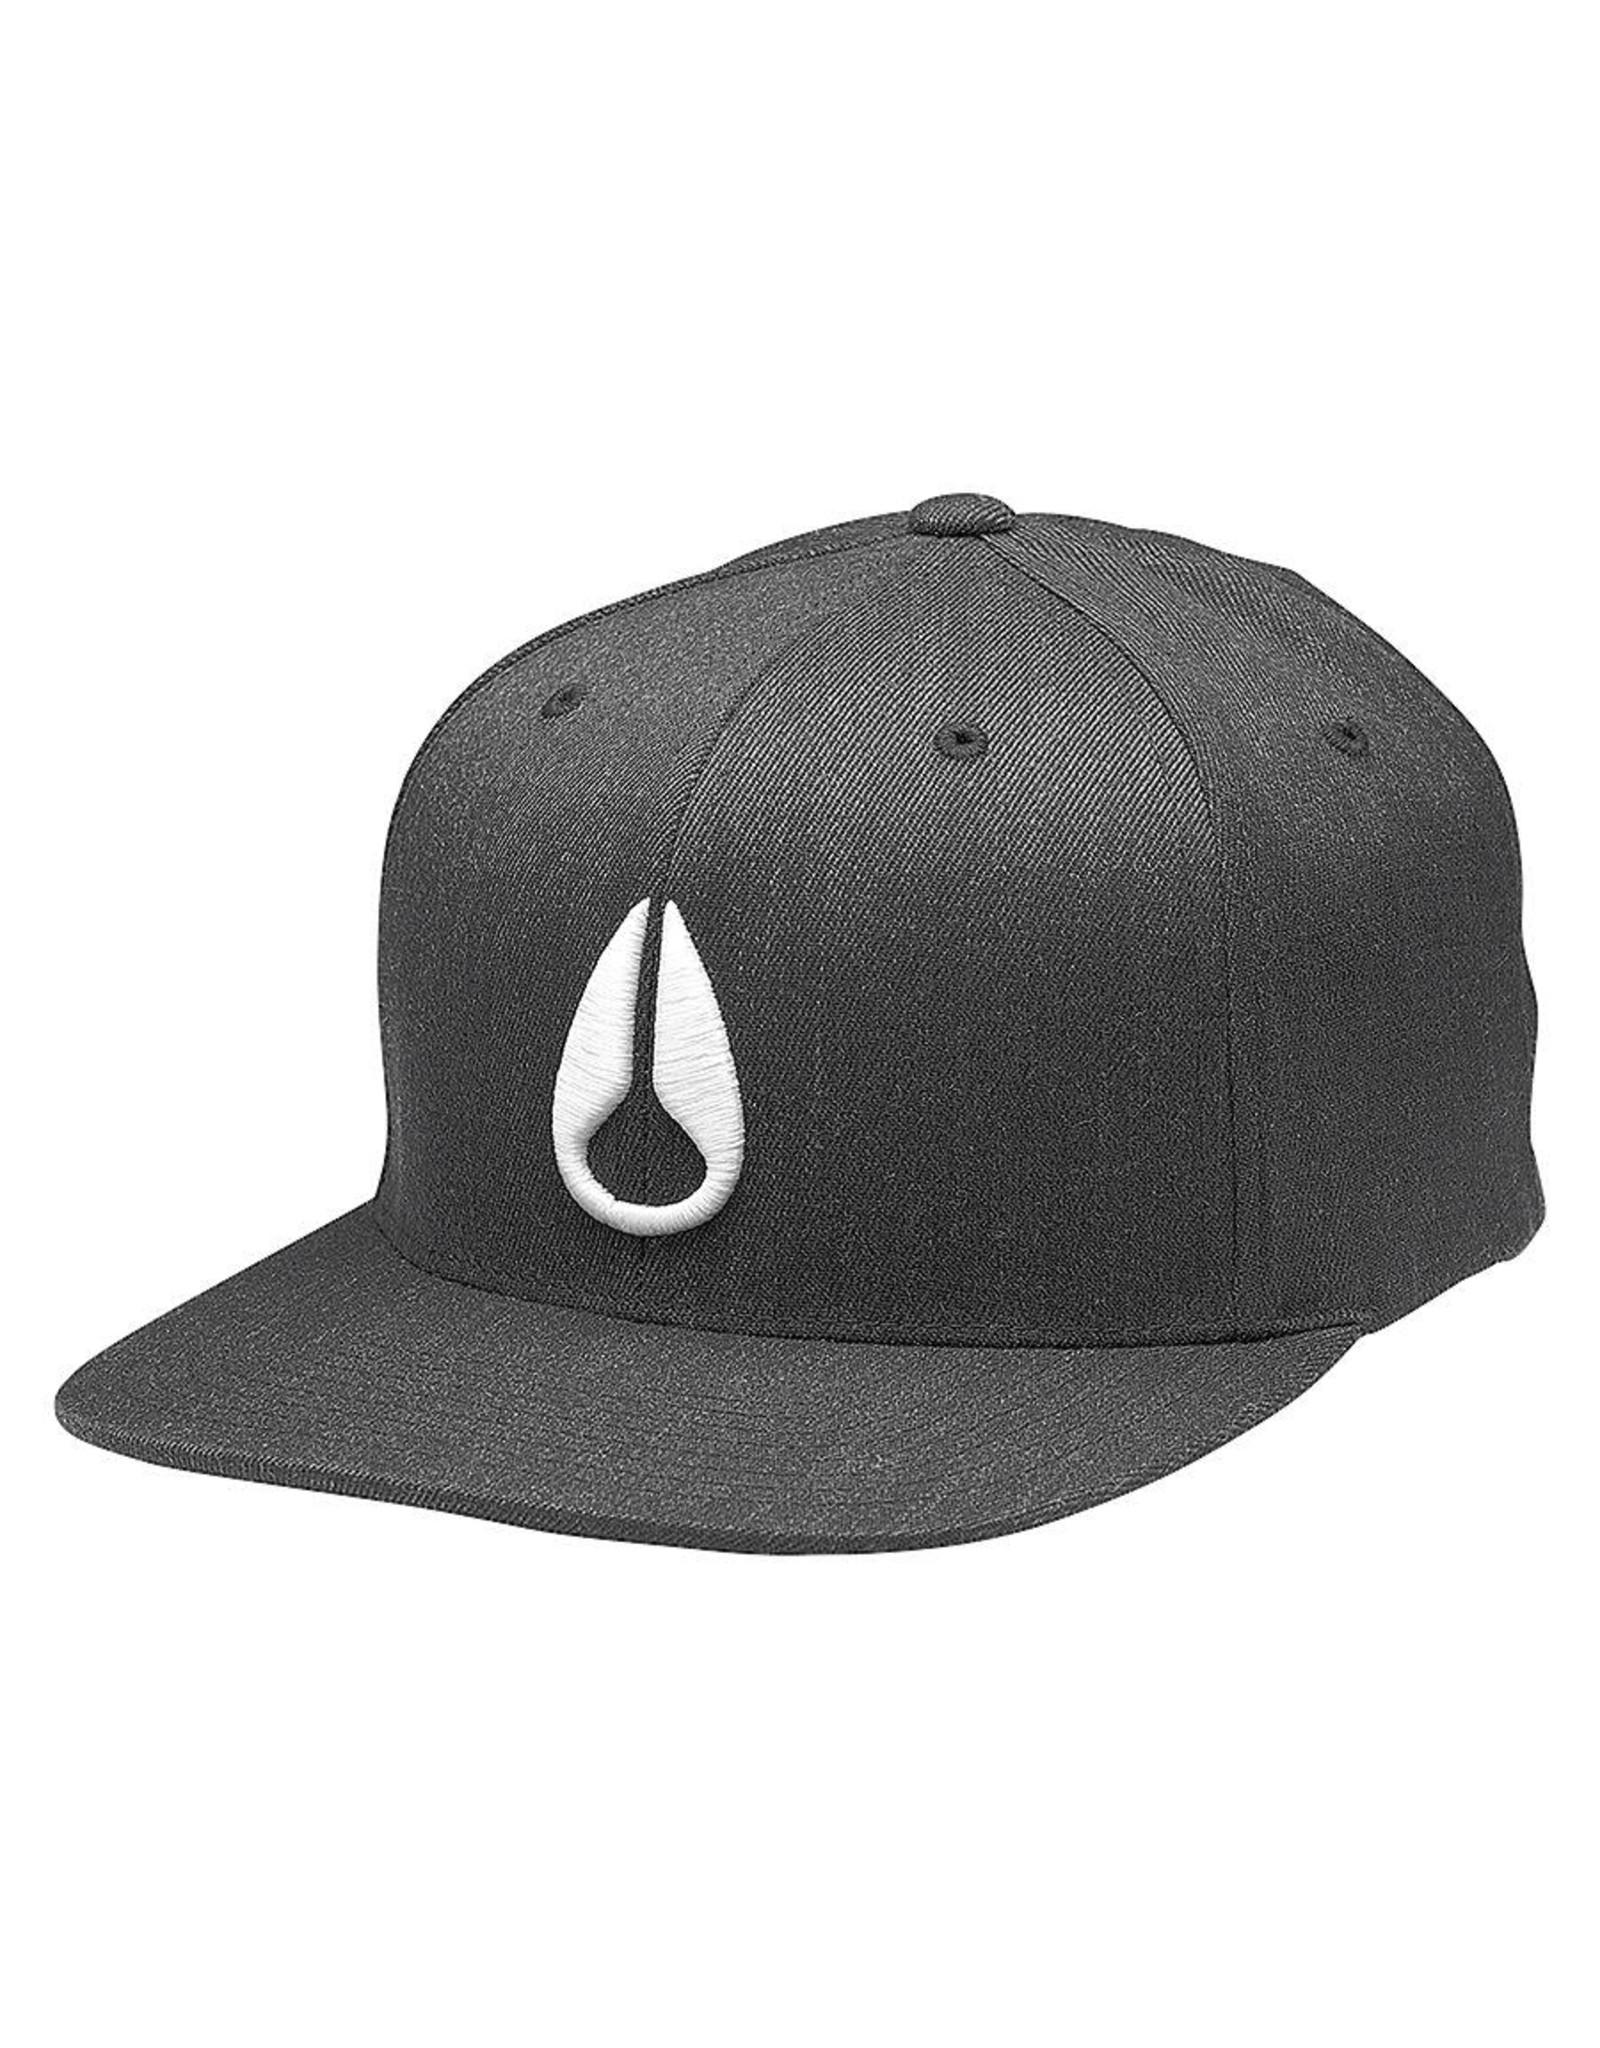 NIXON Deep Down FlexFit Hat Black Heather/ White